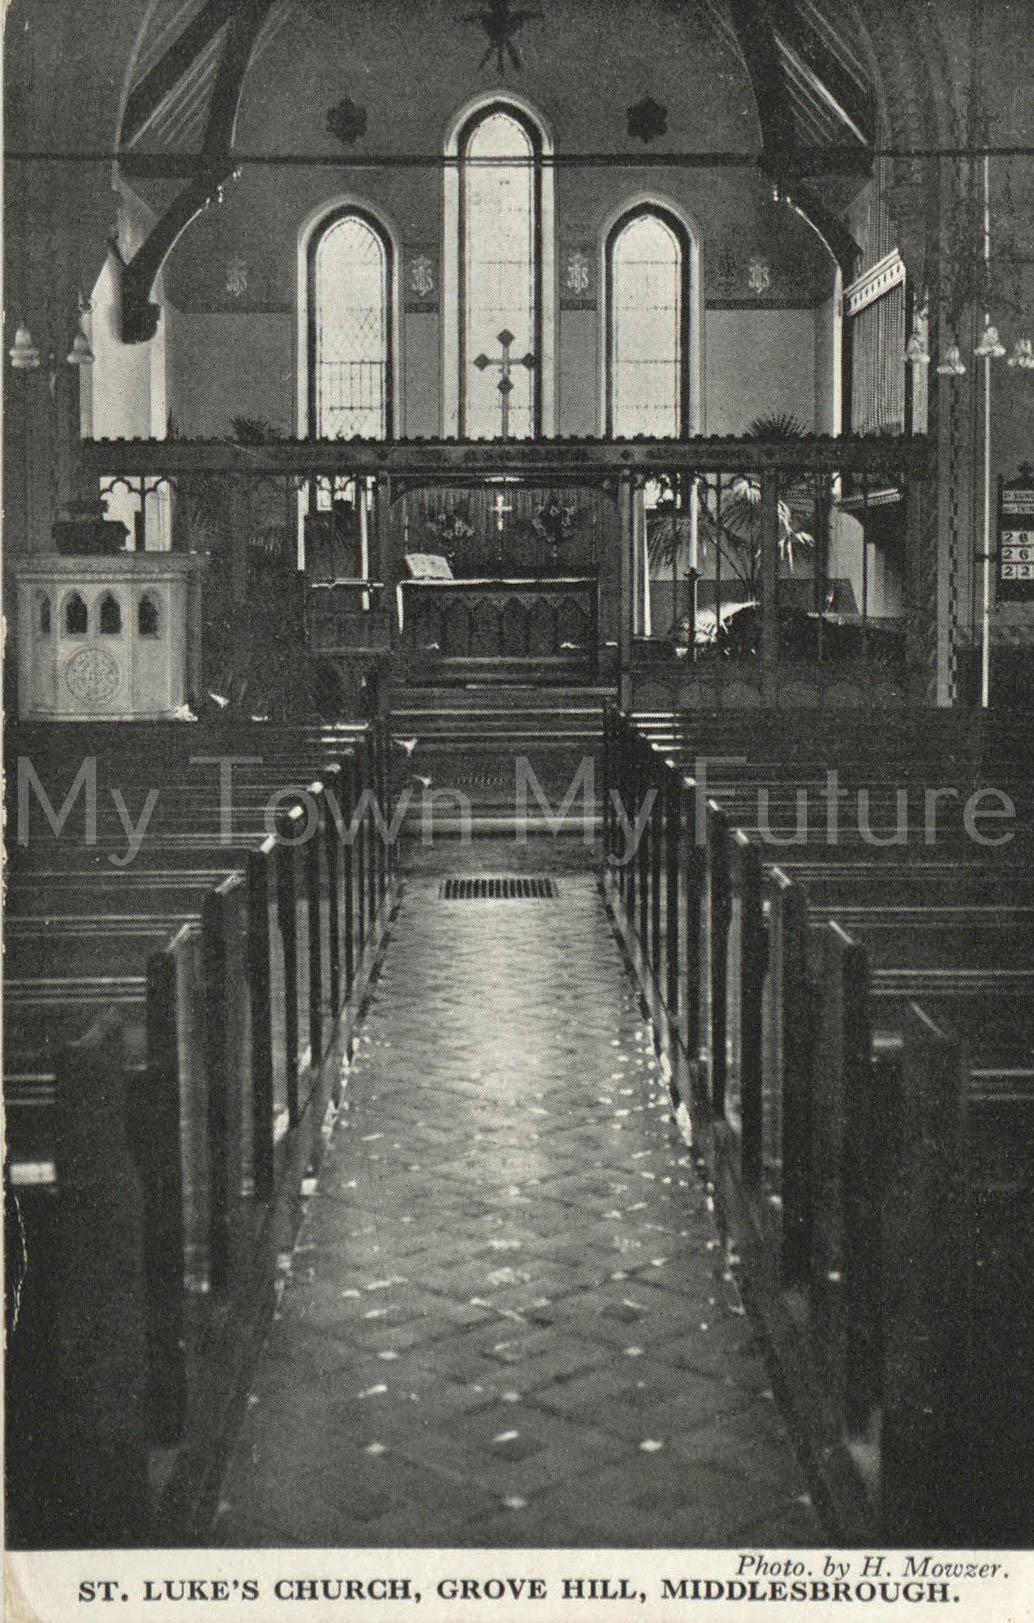 St Luke's Church,Grove Hill